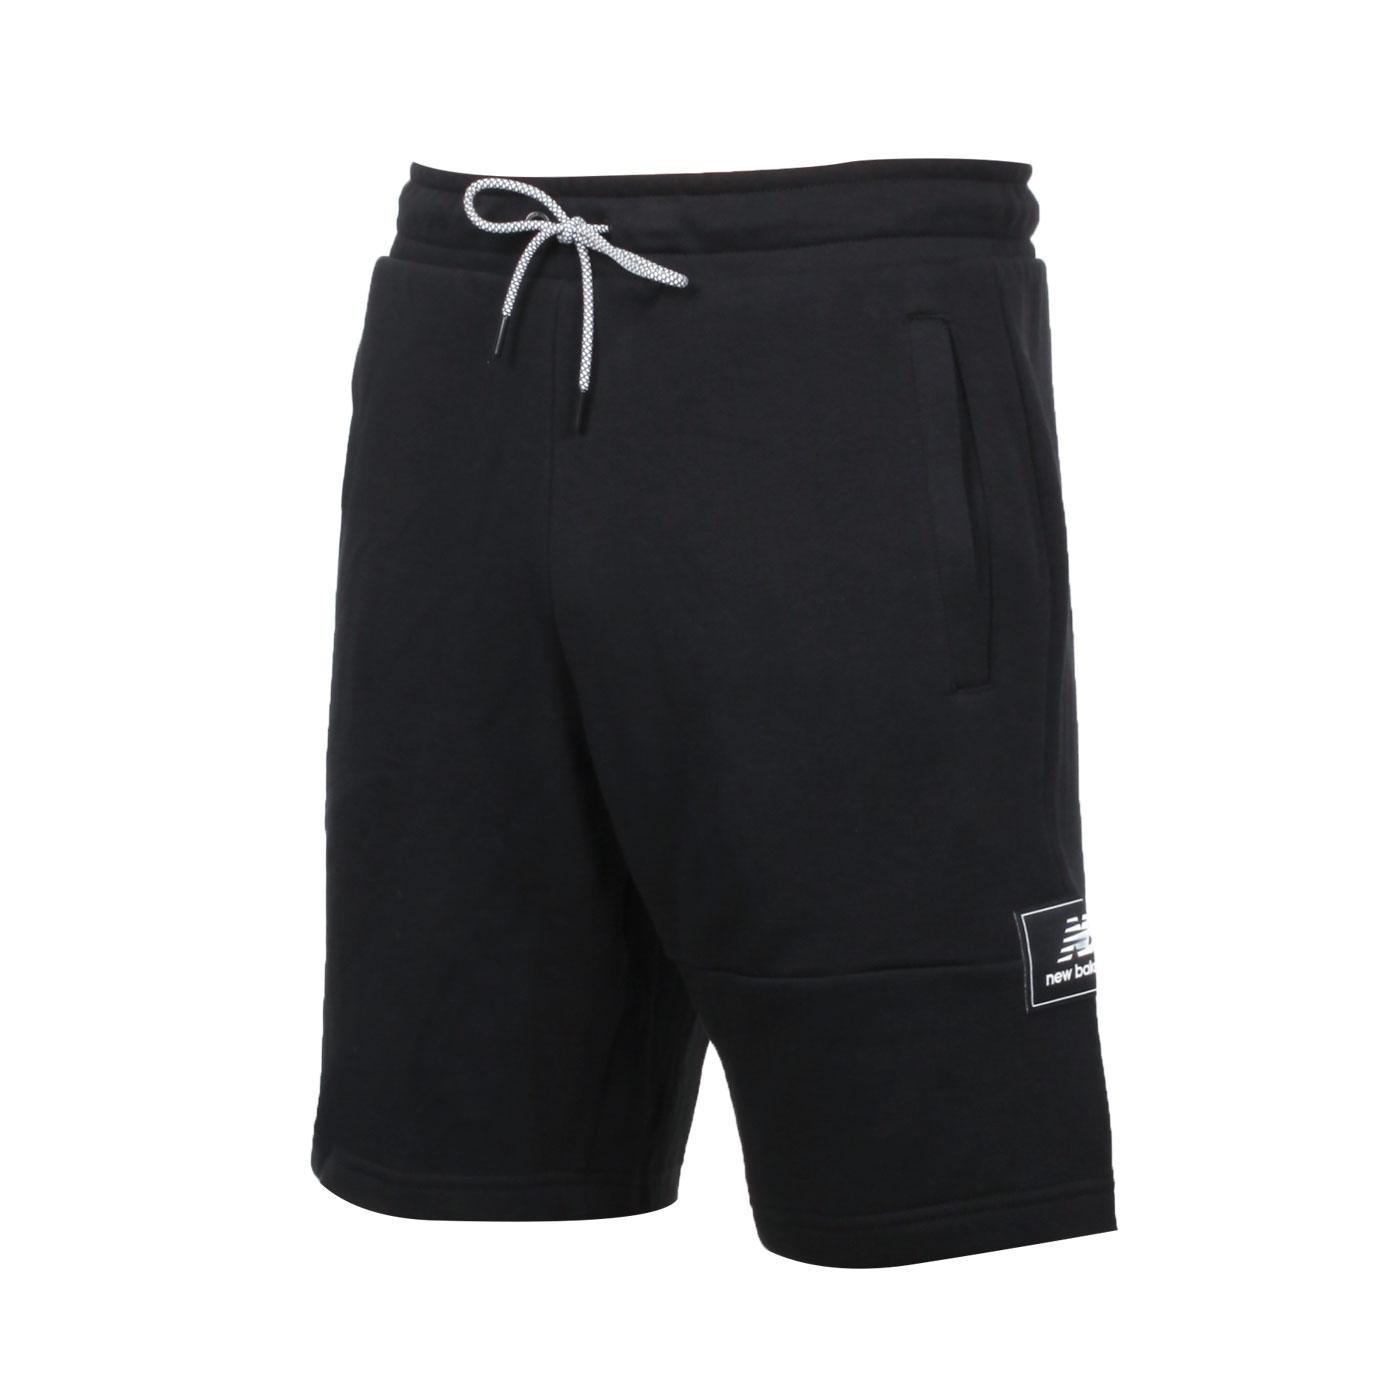 NEW BALANCE 男款棉短褲 AMS13502BK